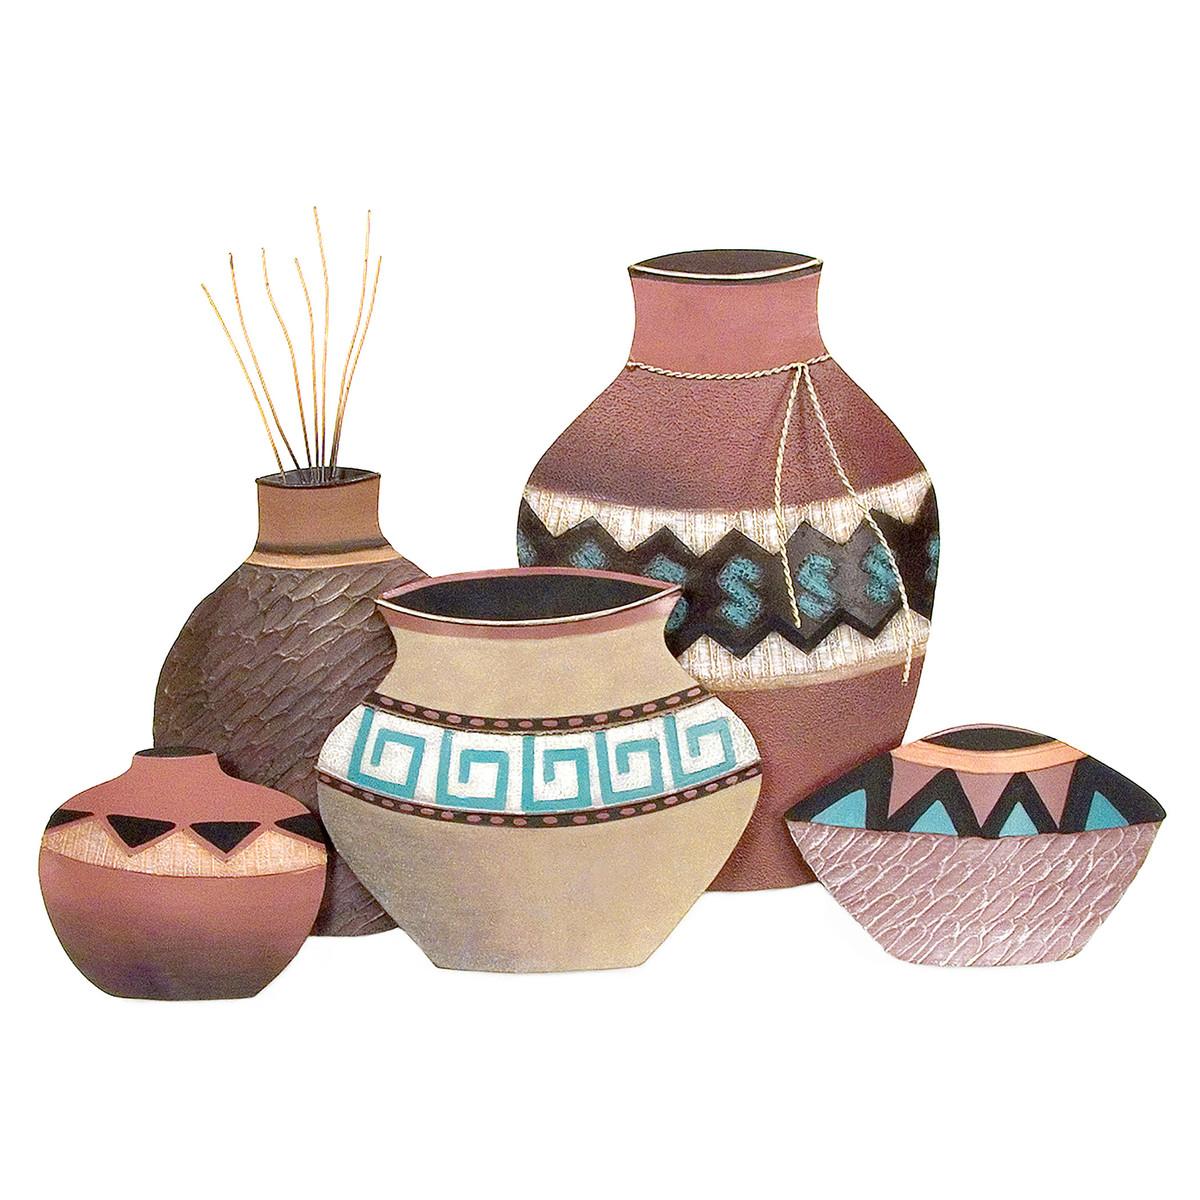 Southwestern Wares Pottery Artwork